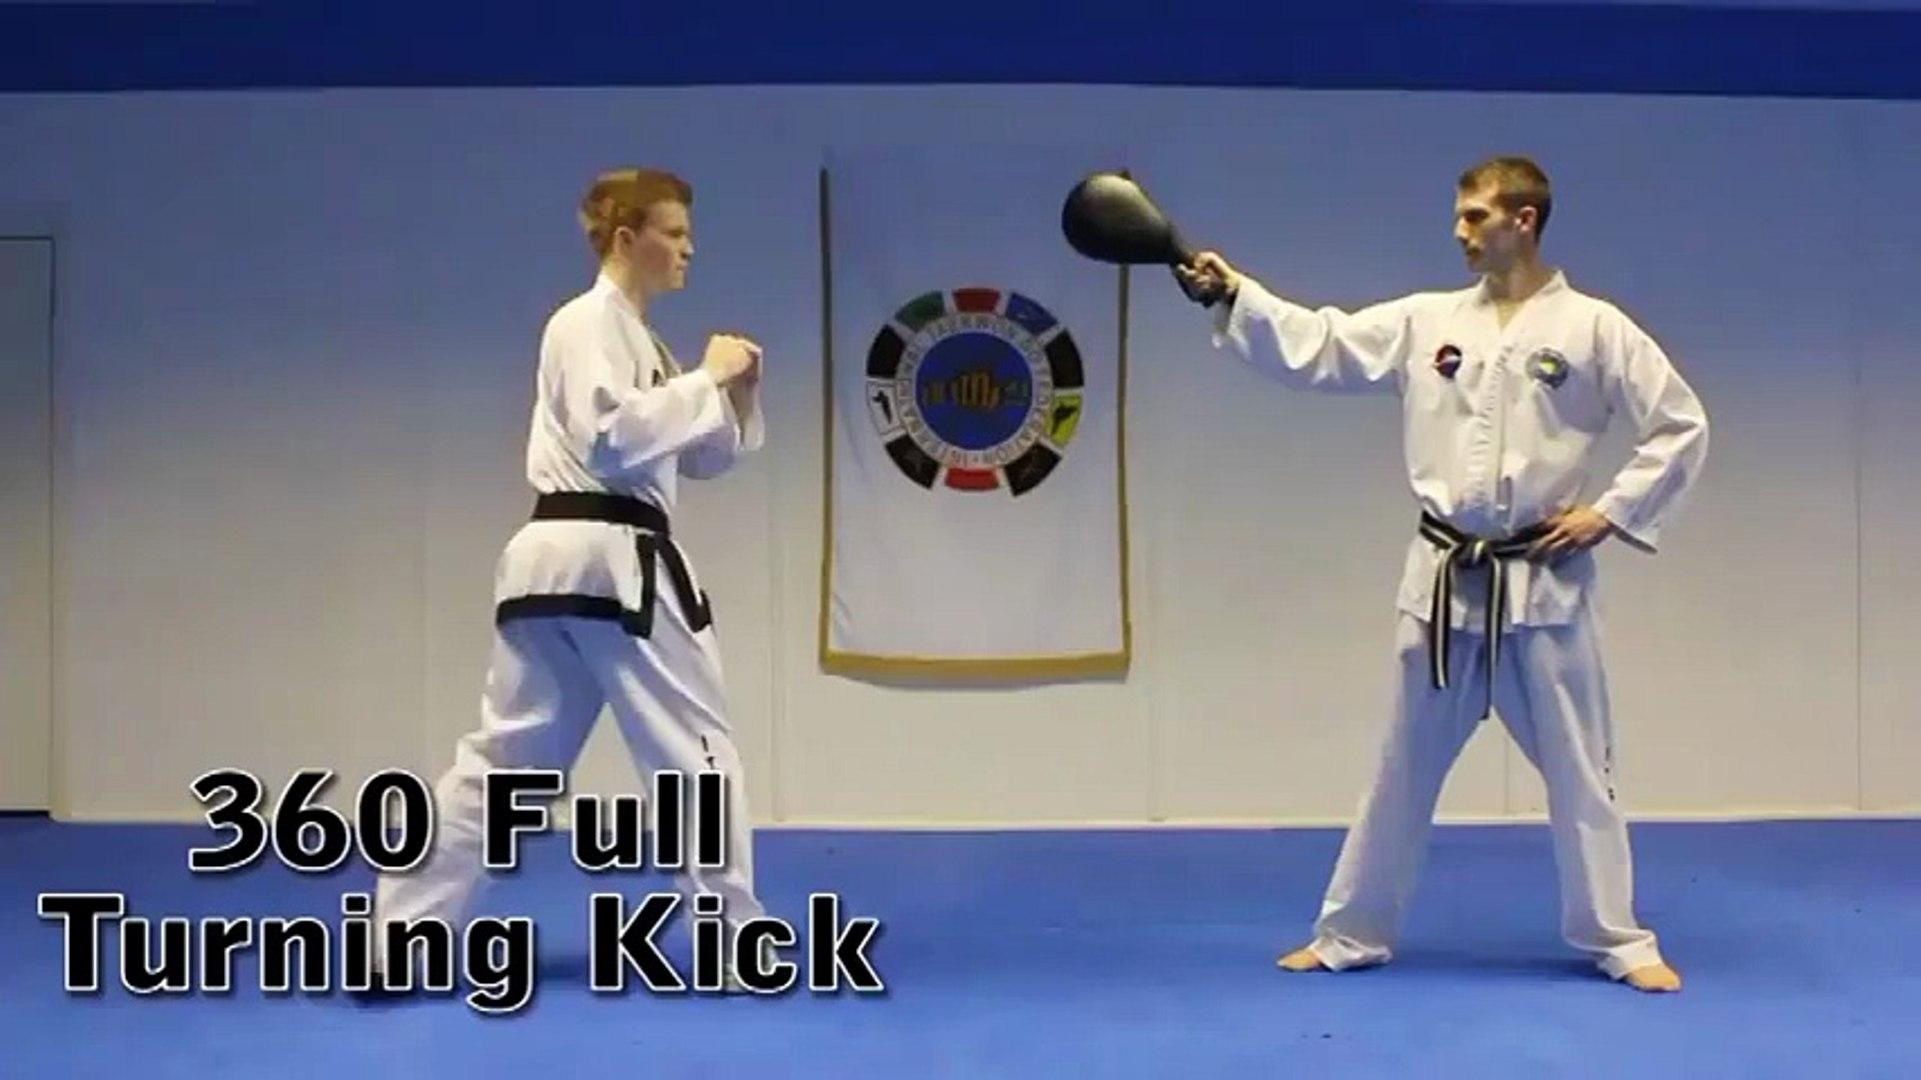 Taekwondo Kicking Tutorials Promo